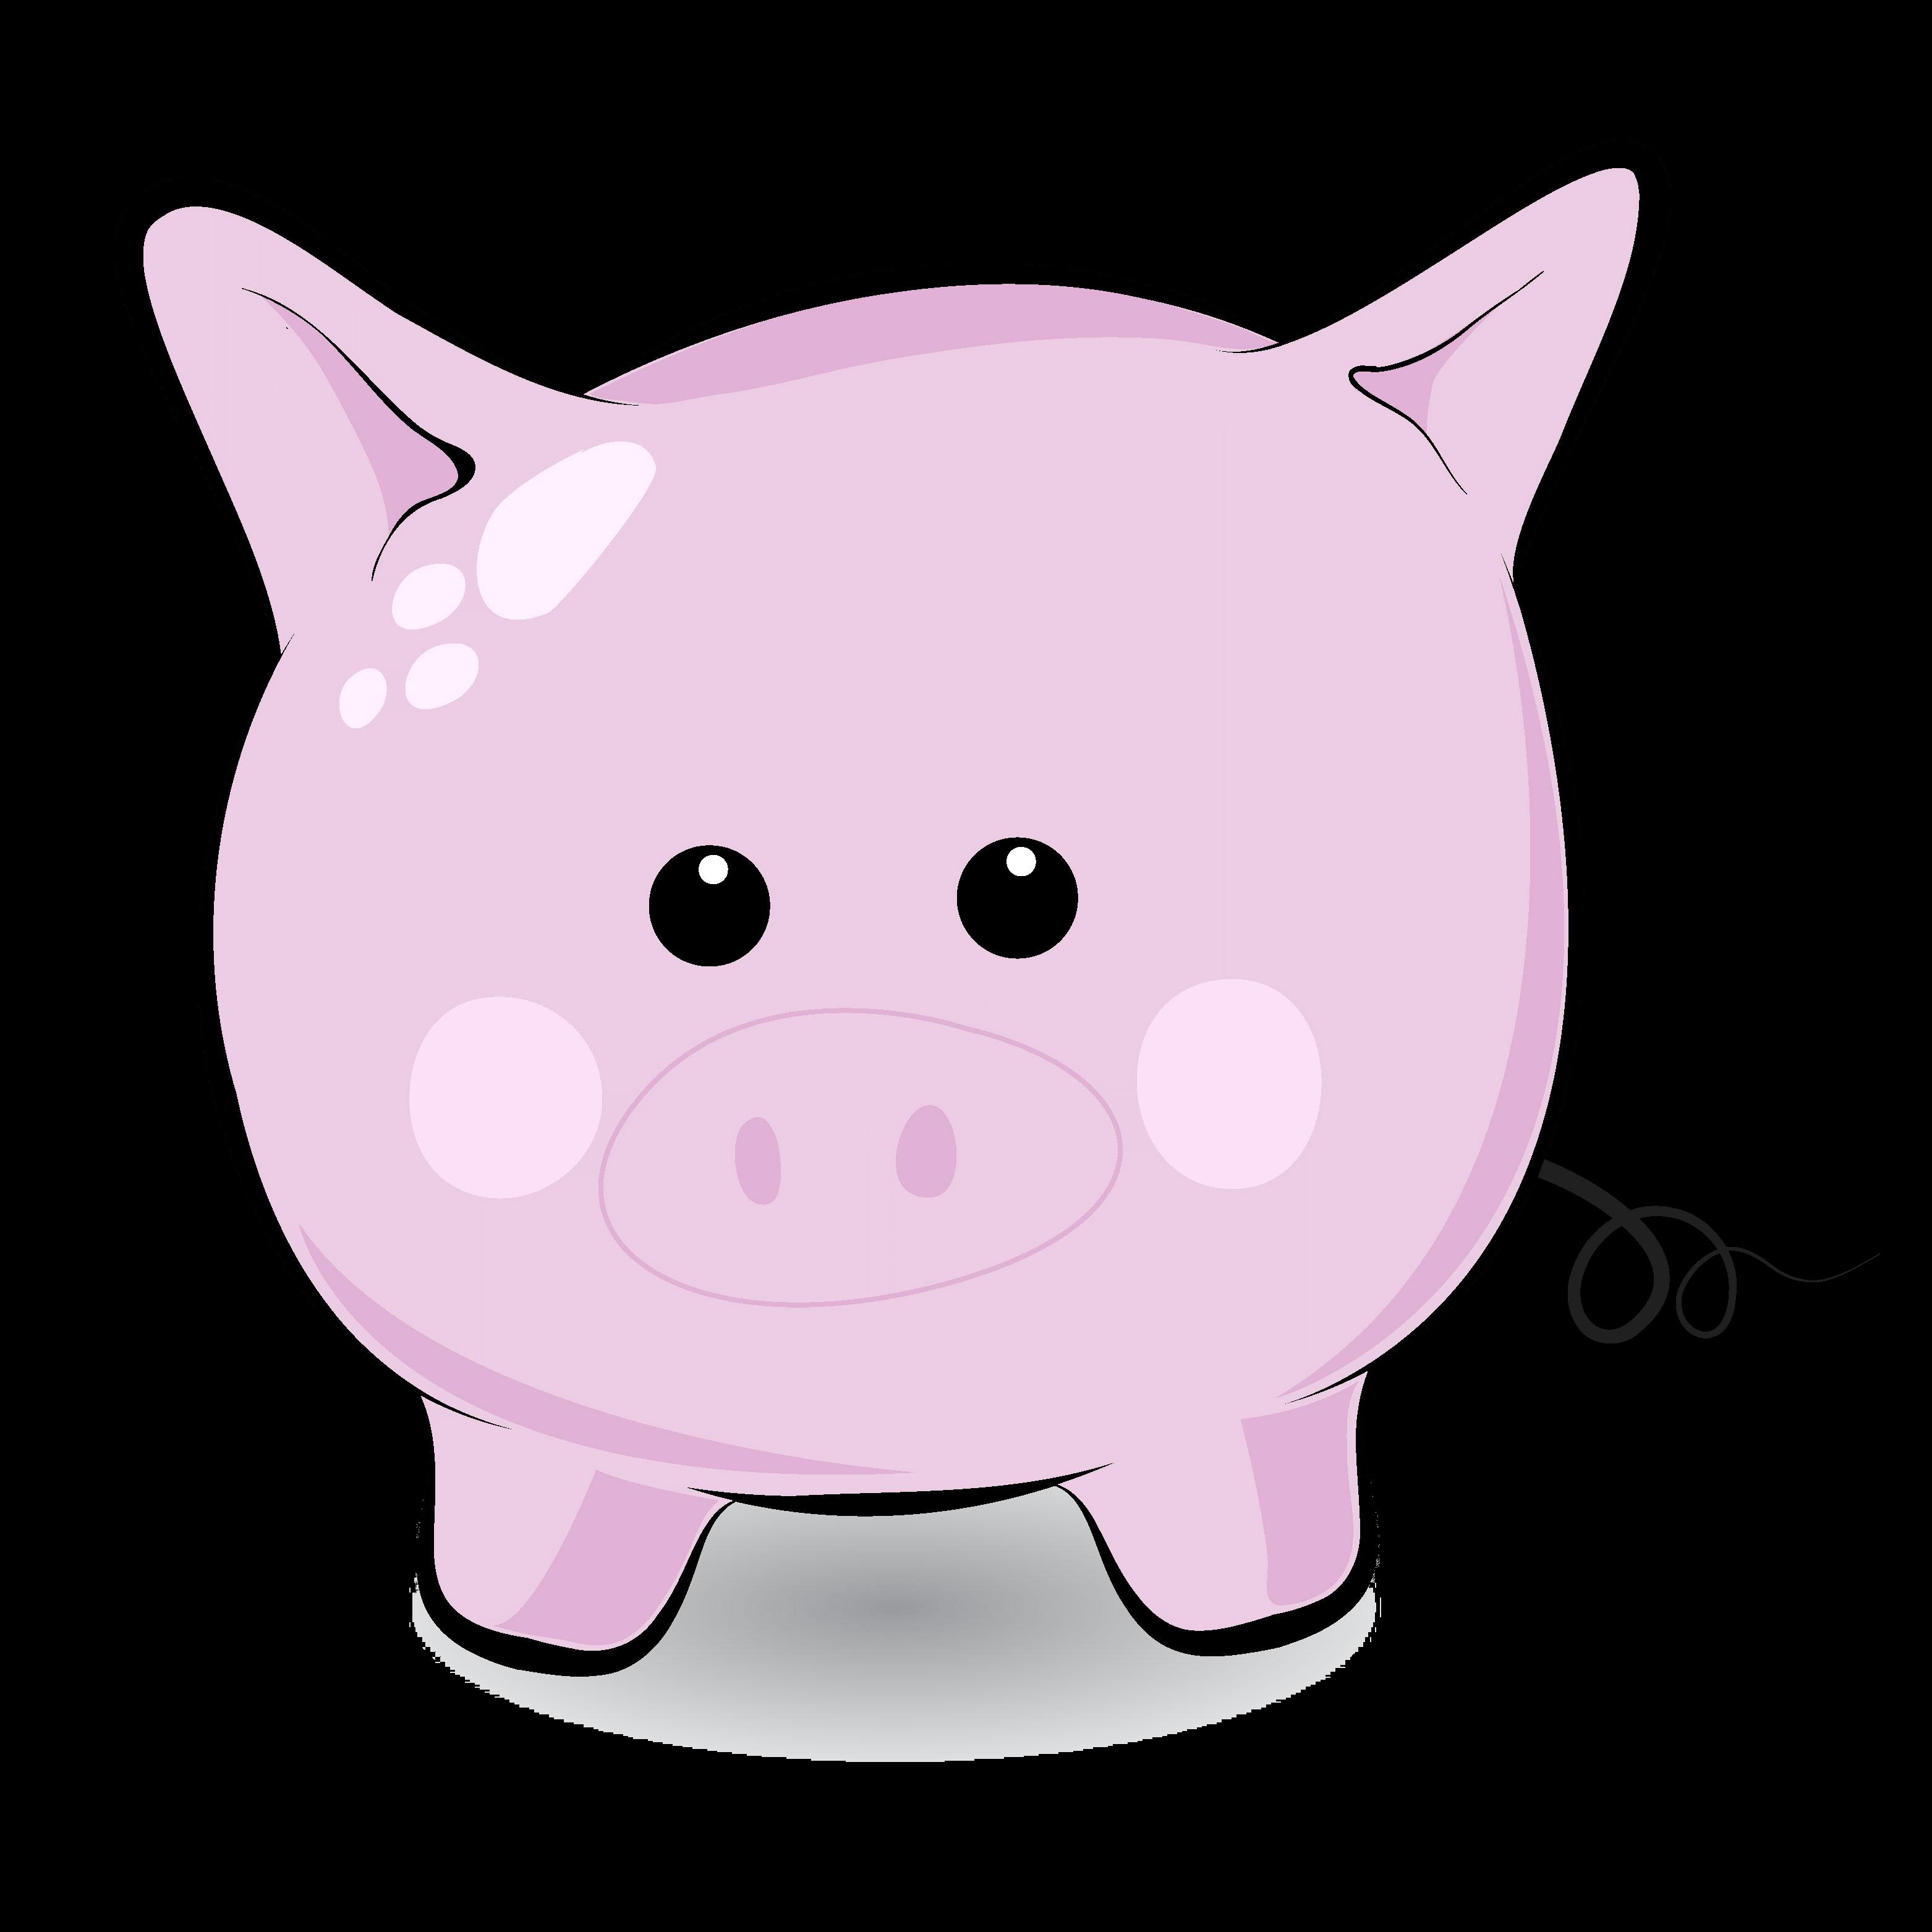 Pig cut